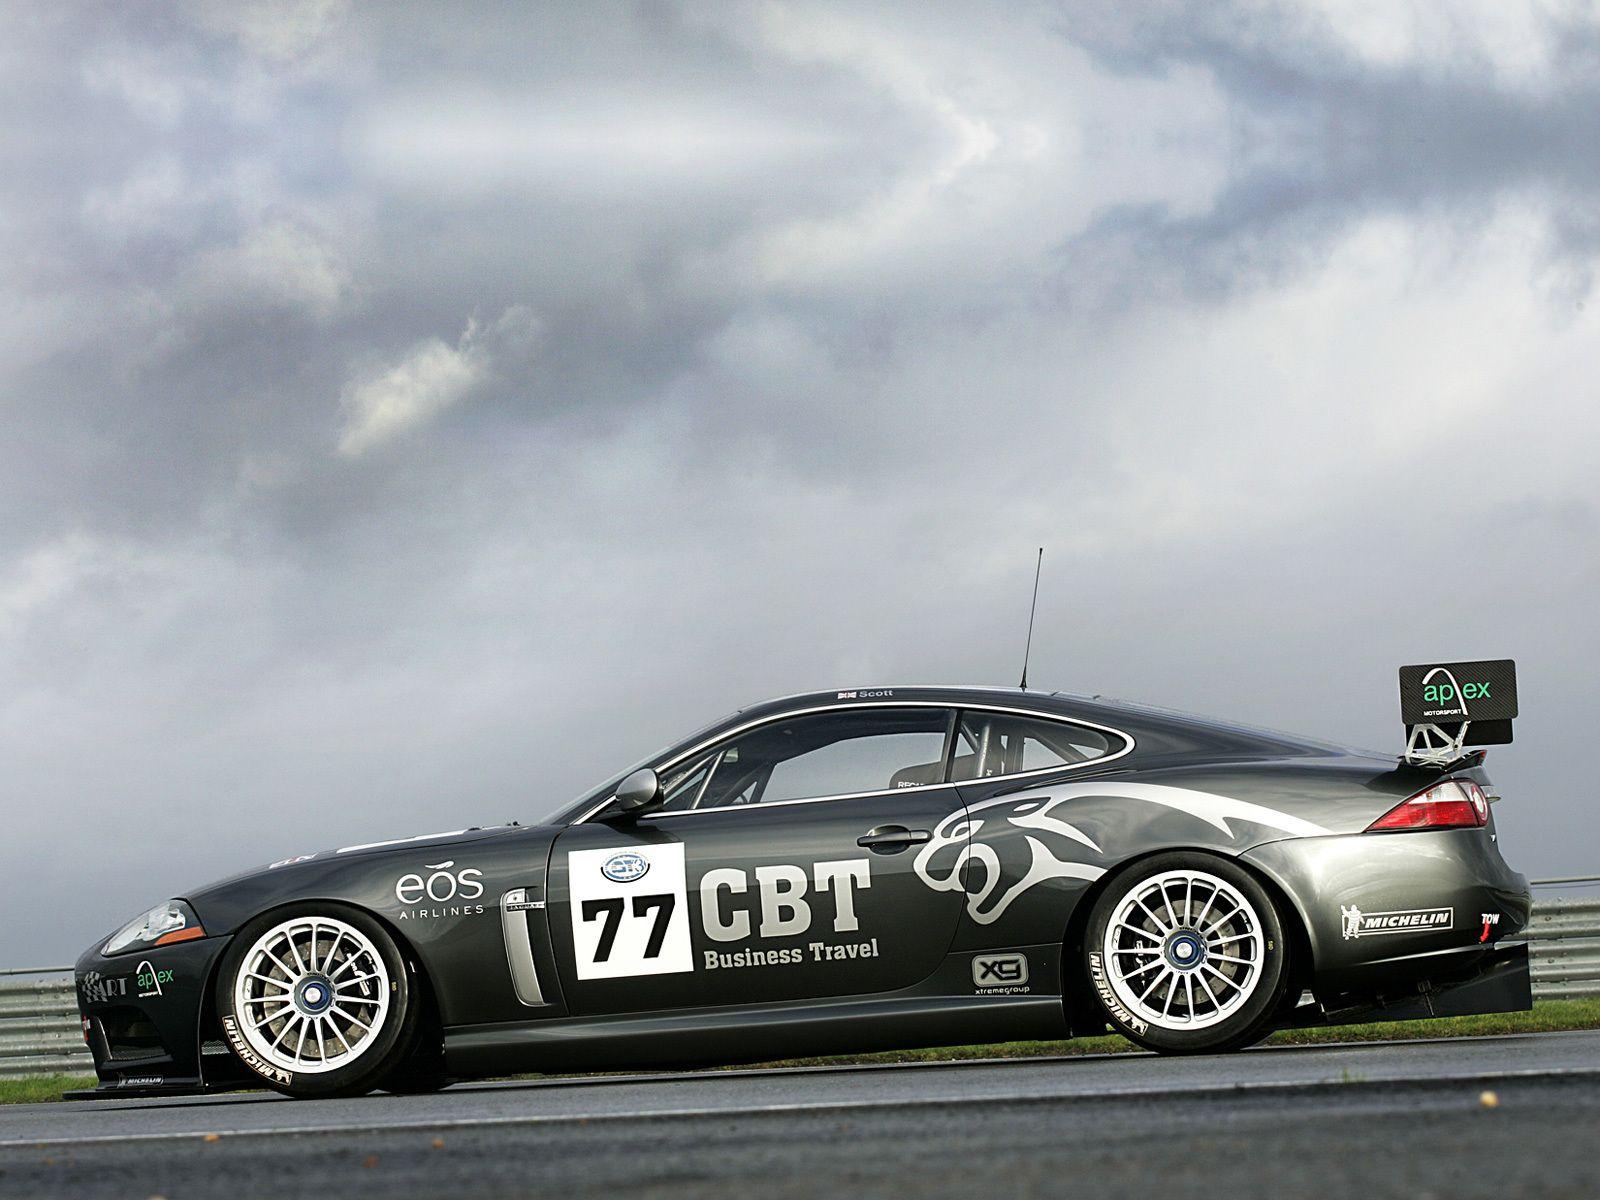 Jaguar Xkr Race Car Car Pinterest Cars And Range Rovers